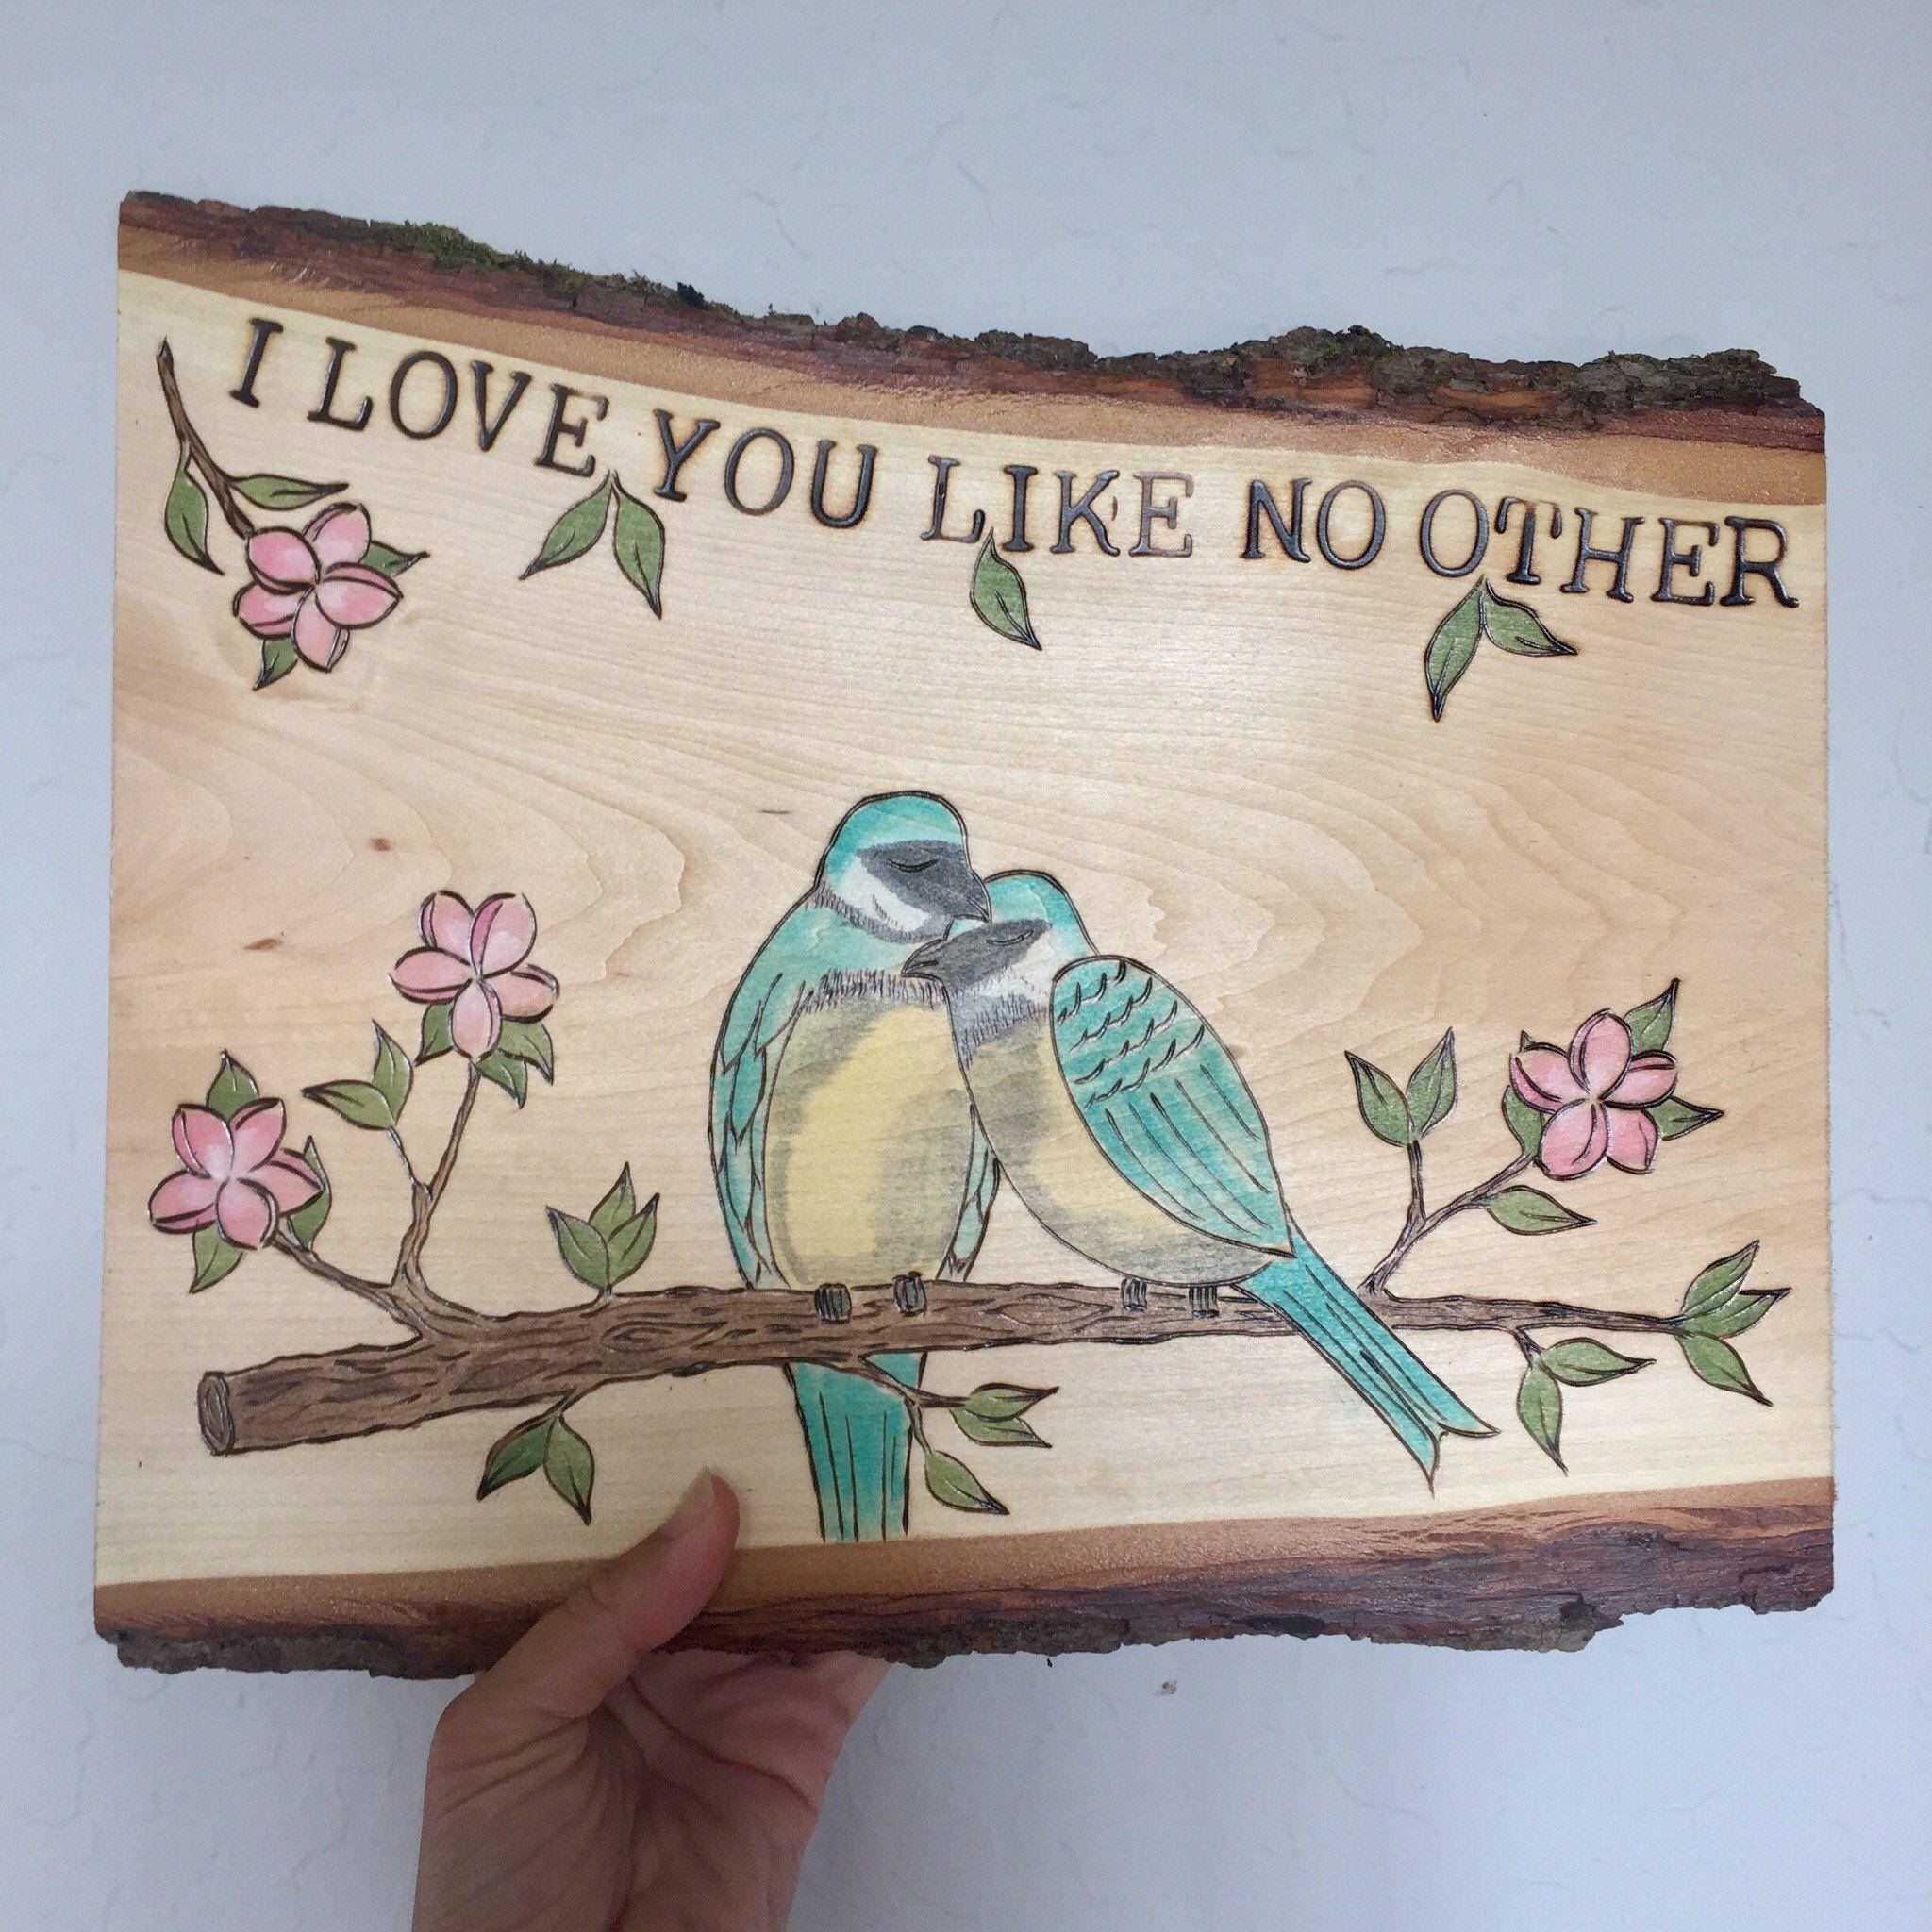 Anniversary keepsake gift personalized wood burned art on tree